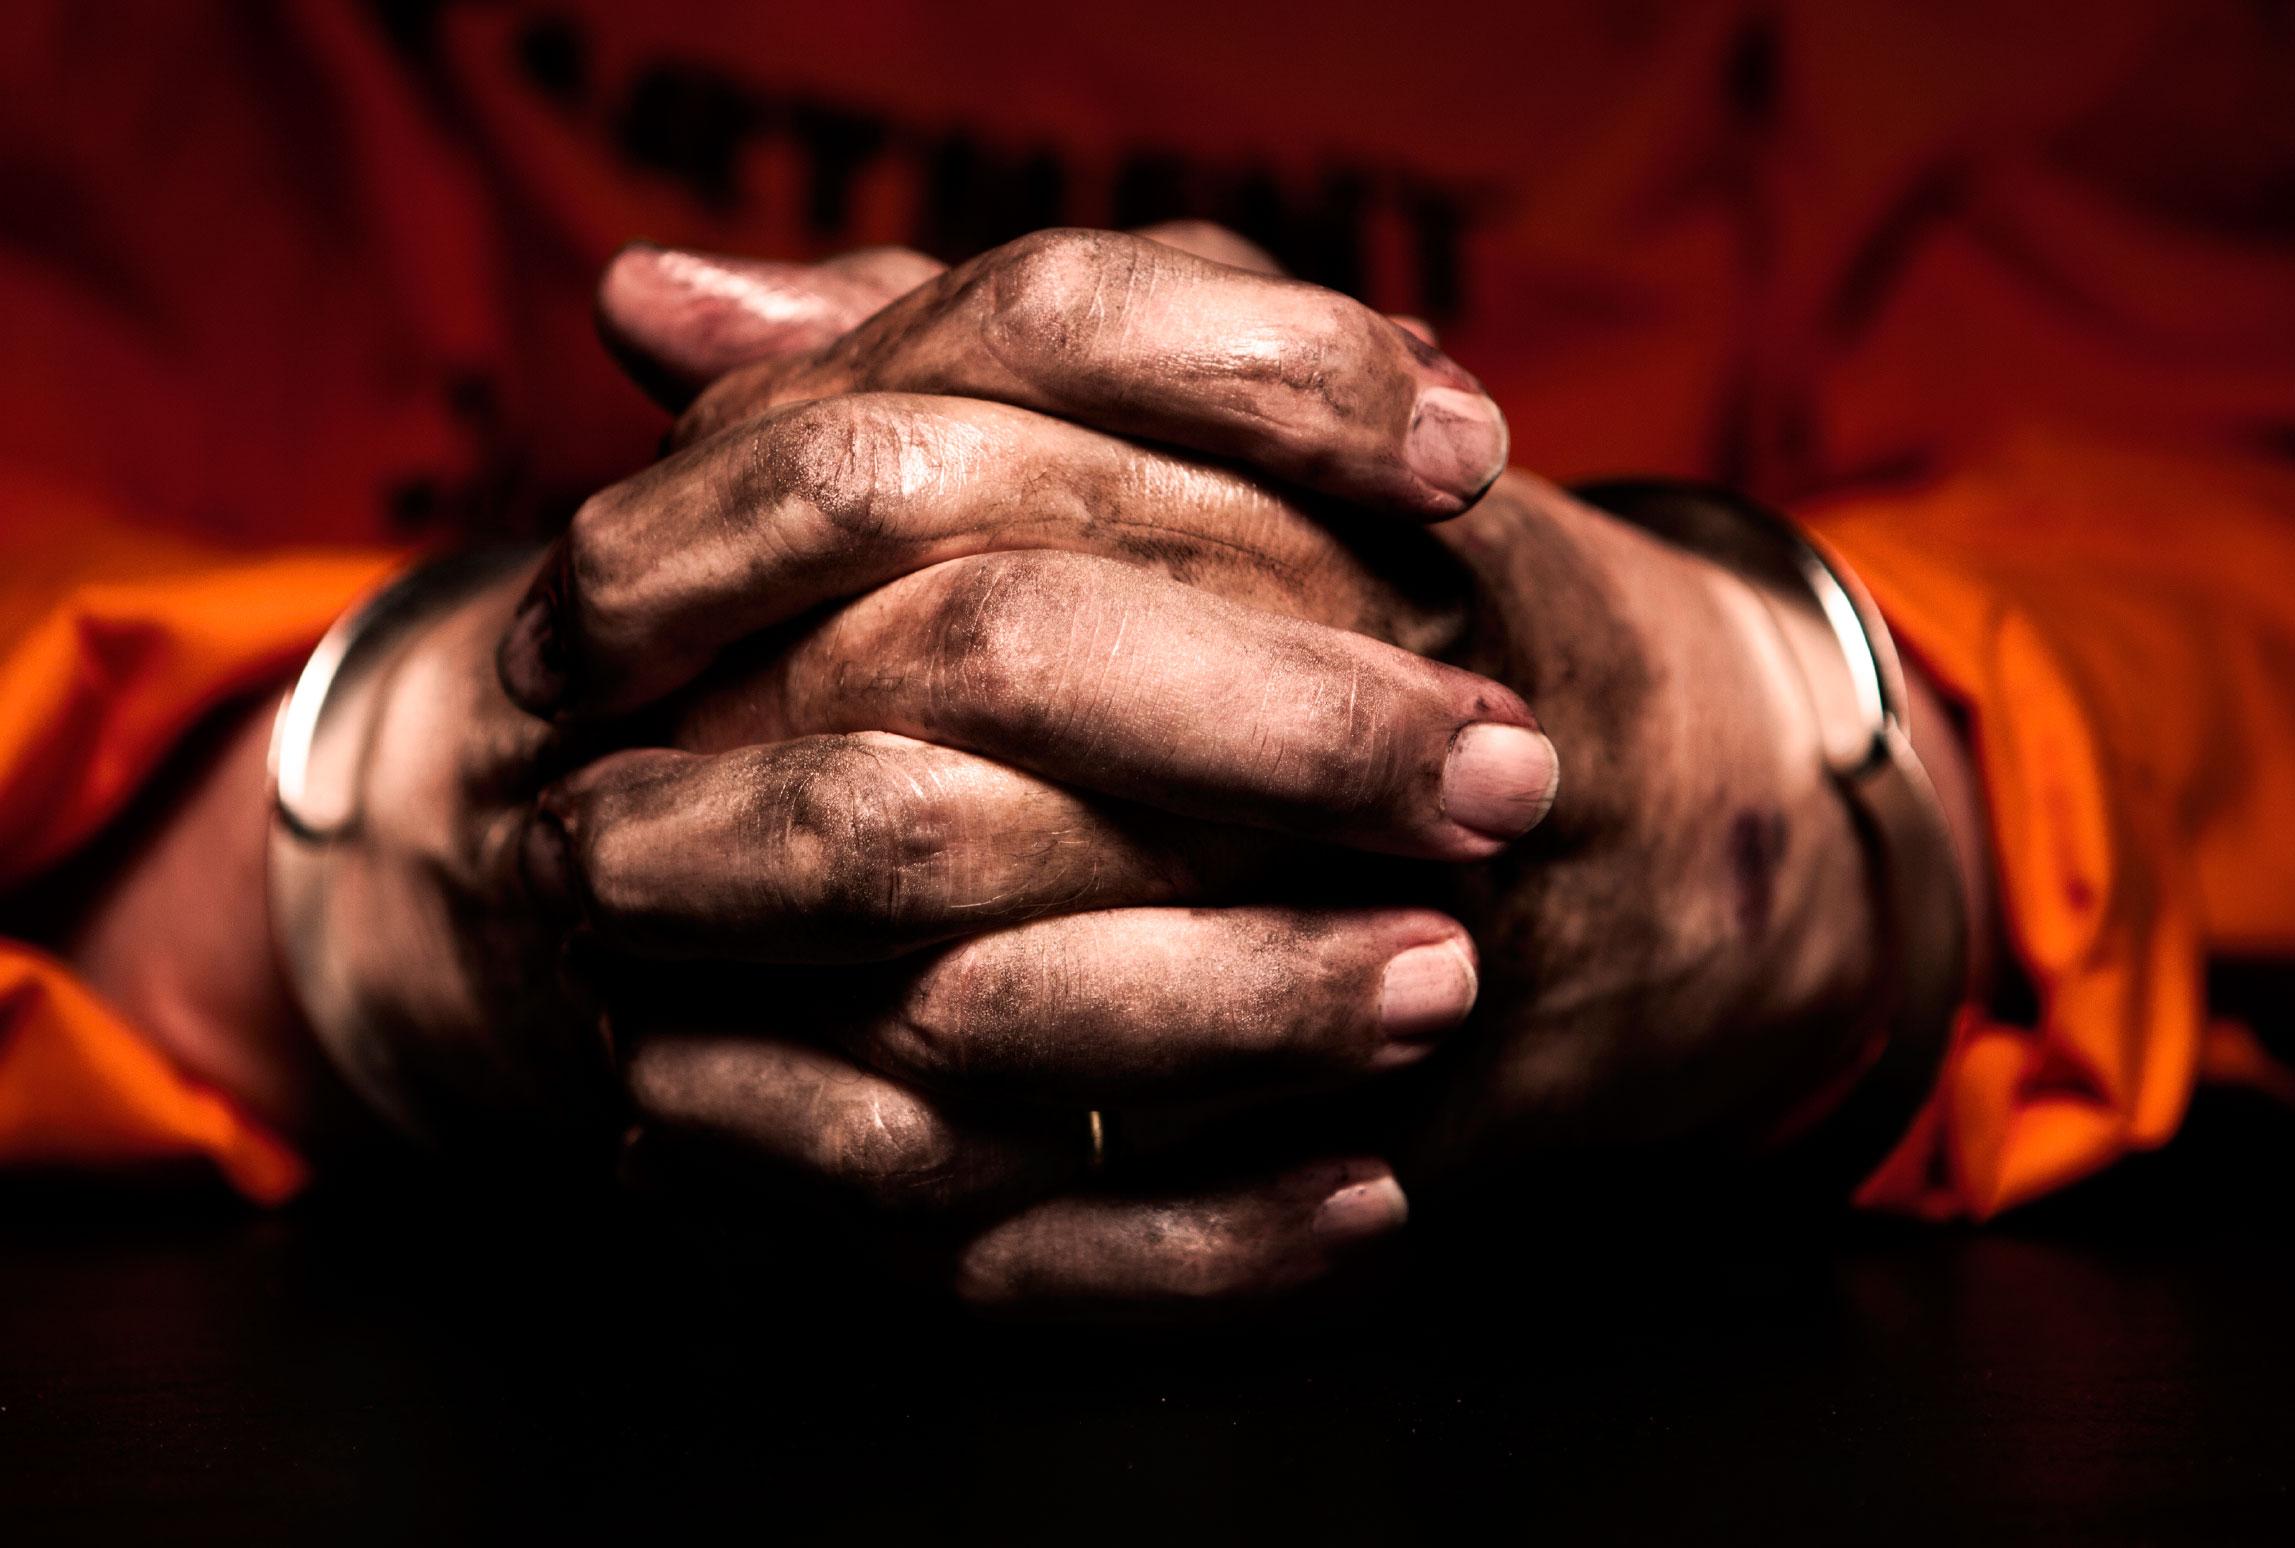 Prison Mission Association - Reaching Prisoners for Christ